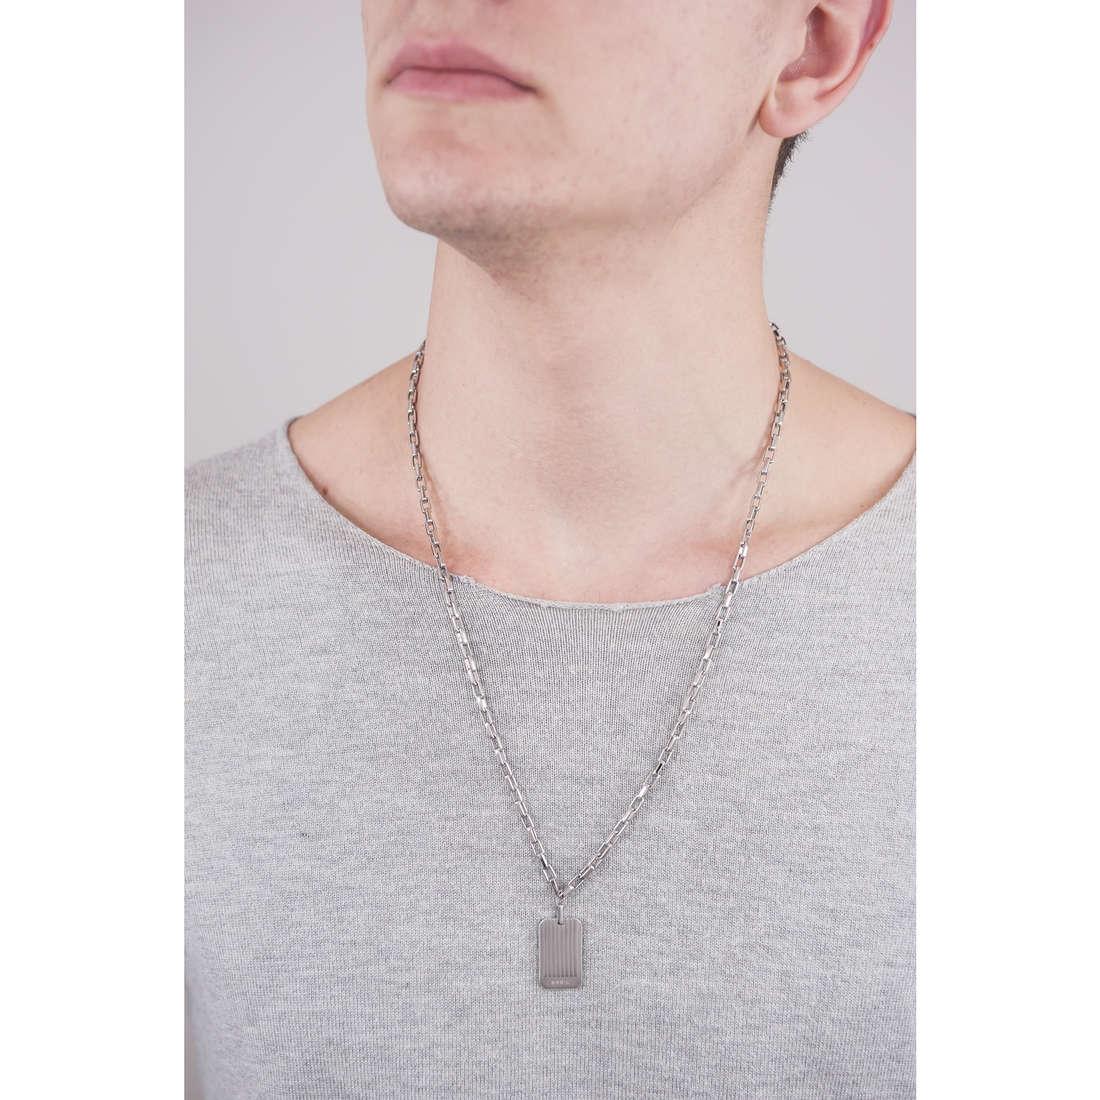 Breil colliers Grades homme TJ1866 indosso